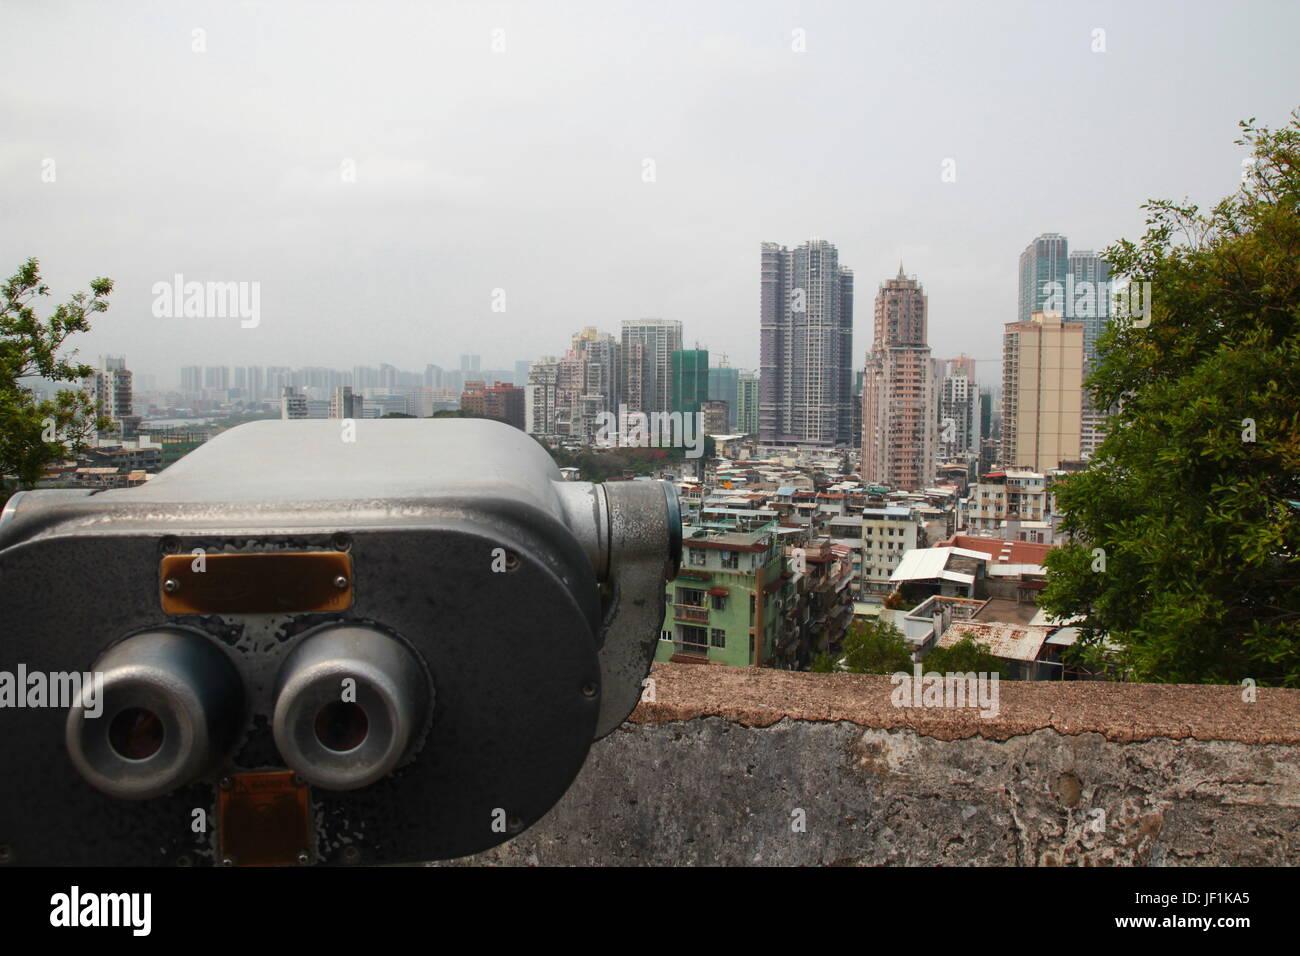 Cityscape of Macau city - Stock Image